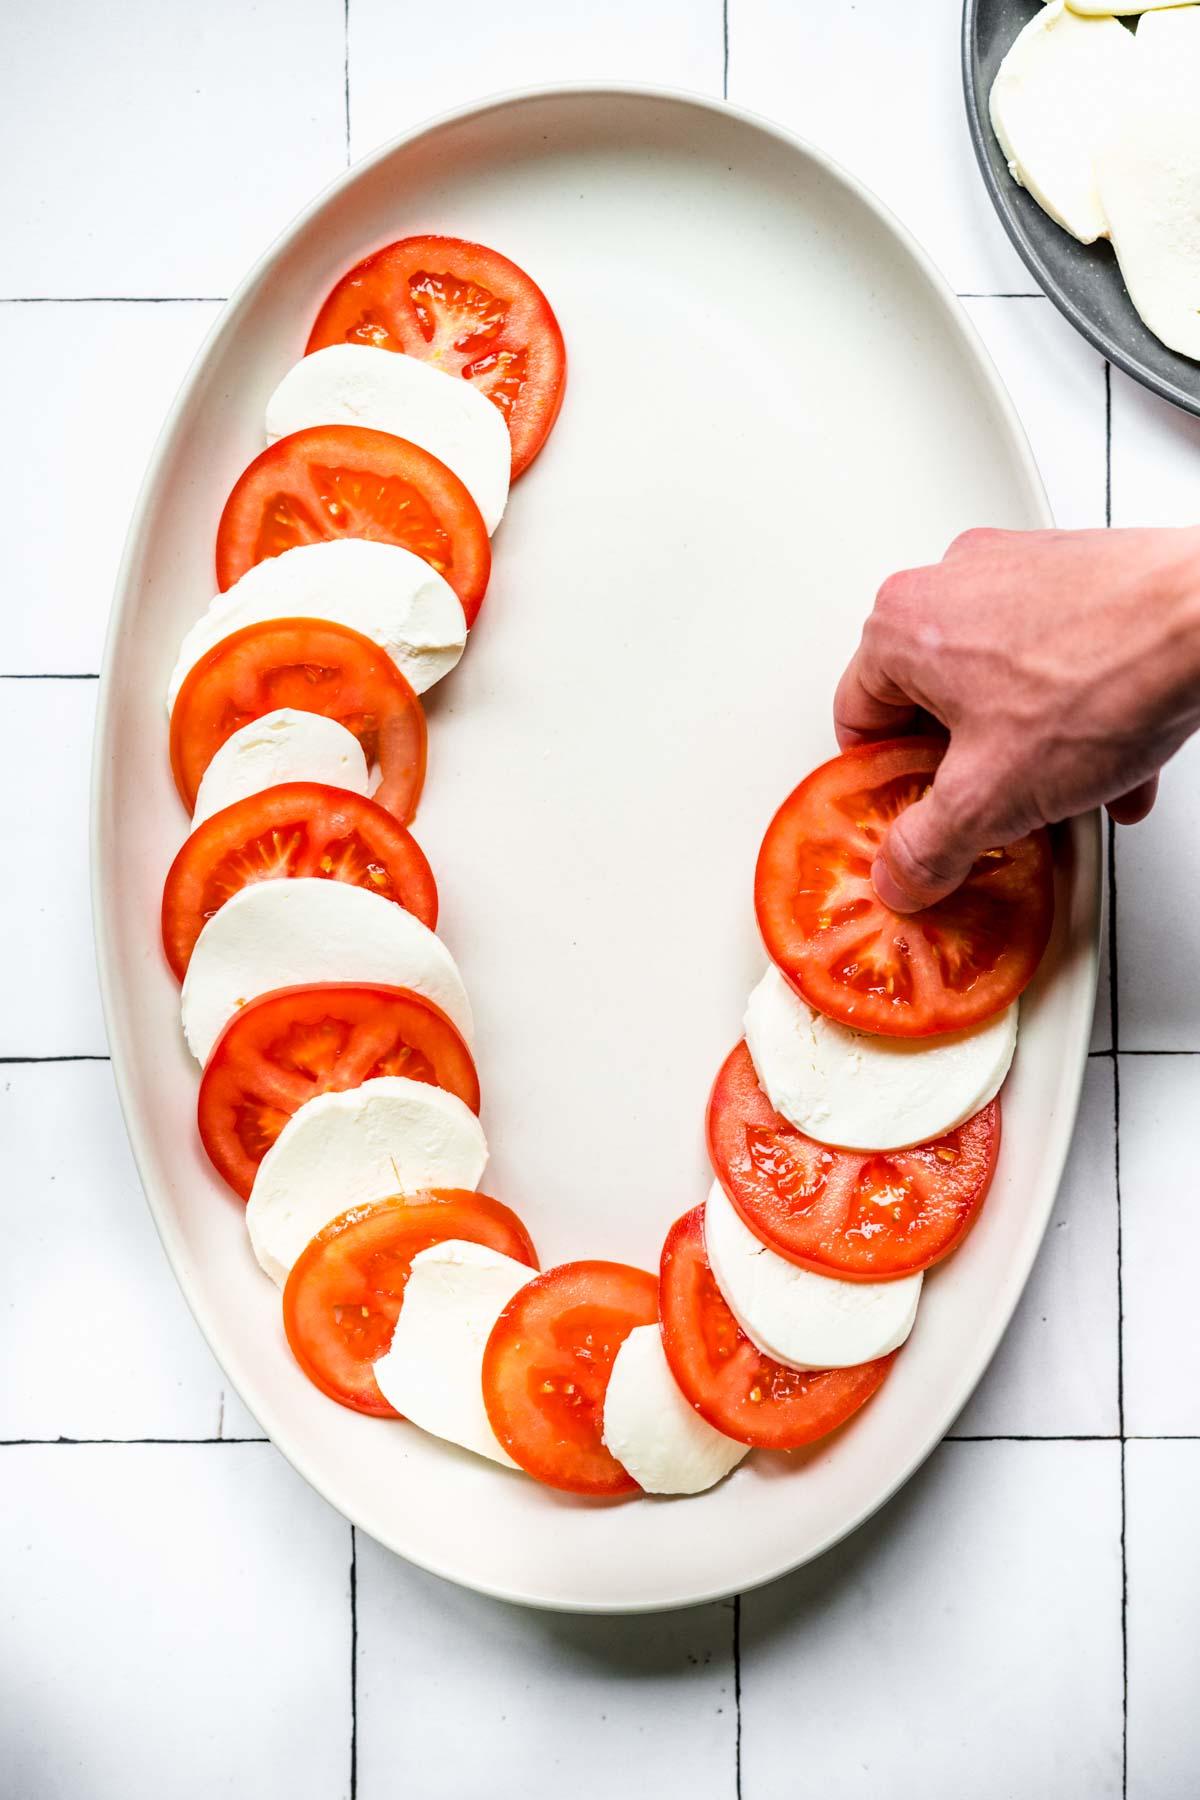 Arranging tomato and mozzarella slices on serving platter for Tomato Mozzarella Salad